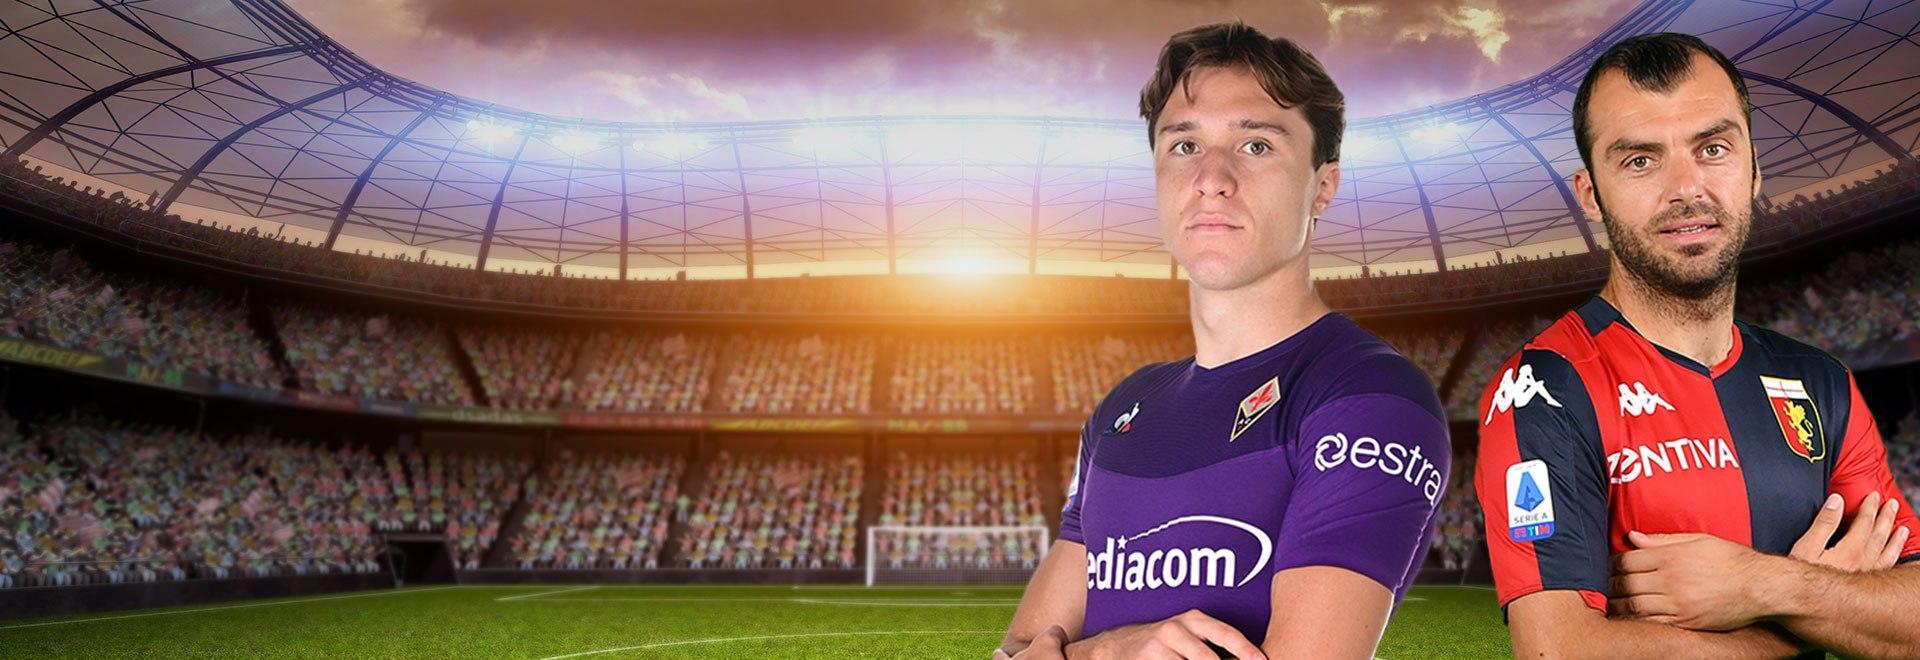 Fiorentina - Genoa. 21a g.